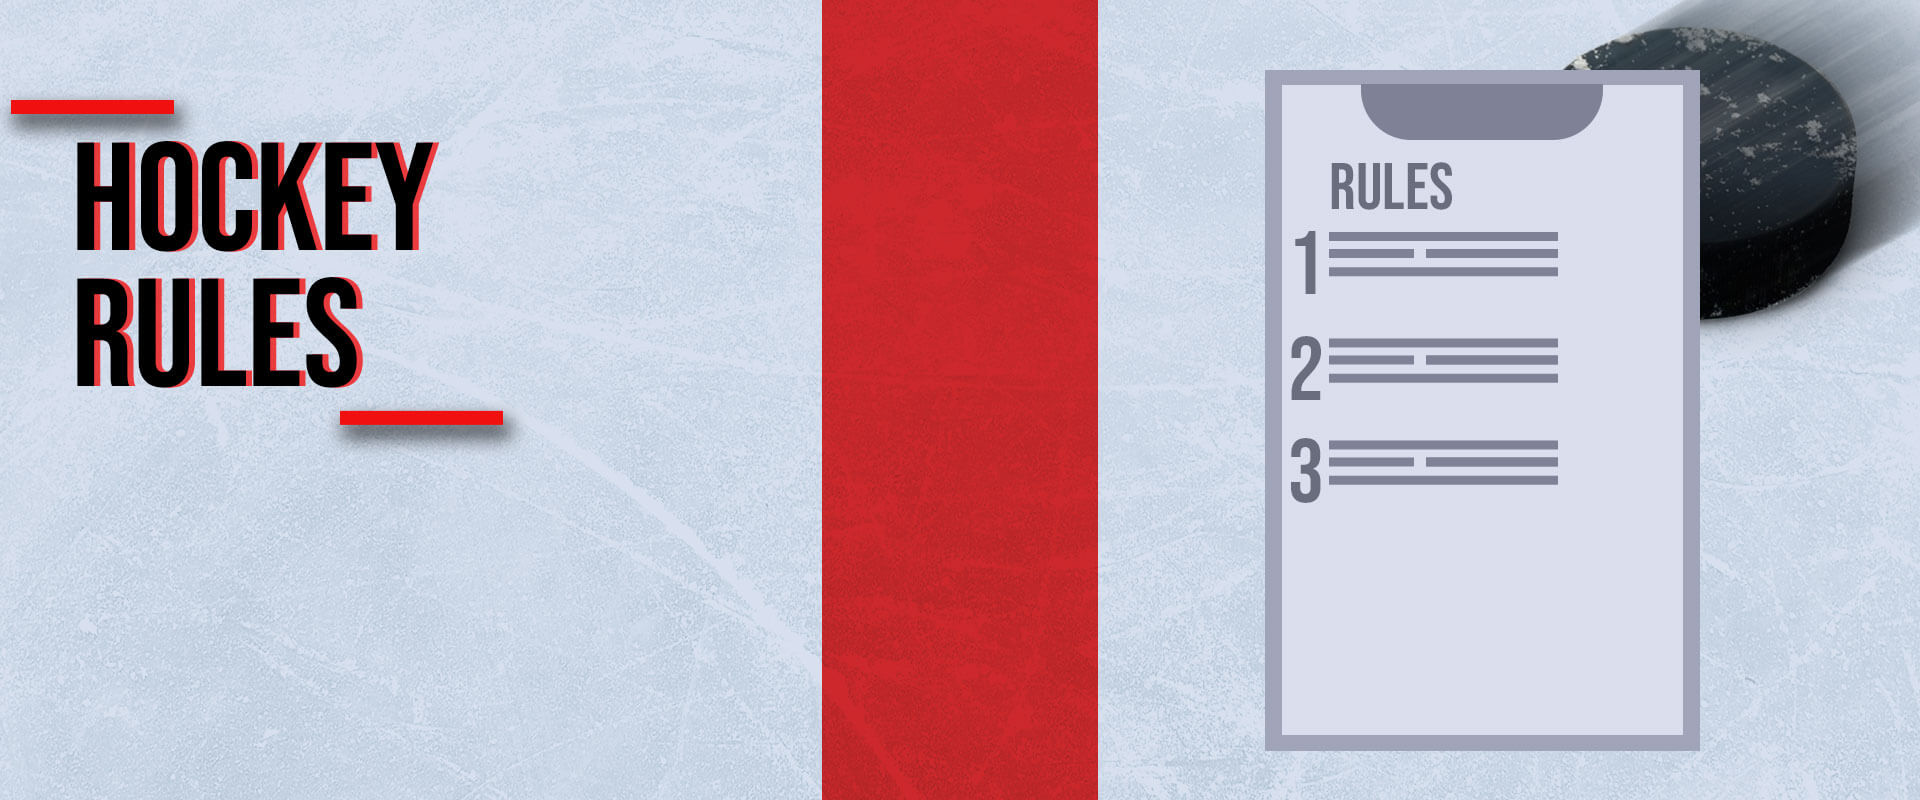 Informative hockey introduction.